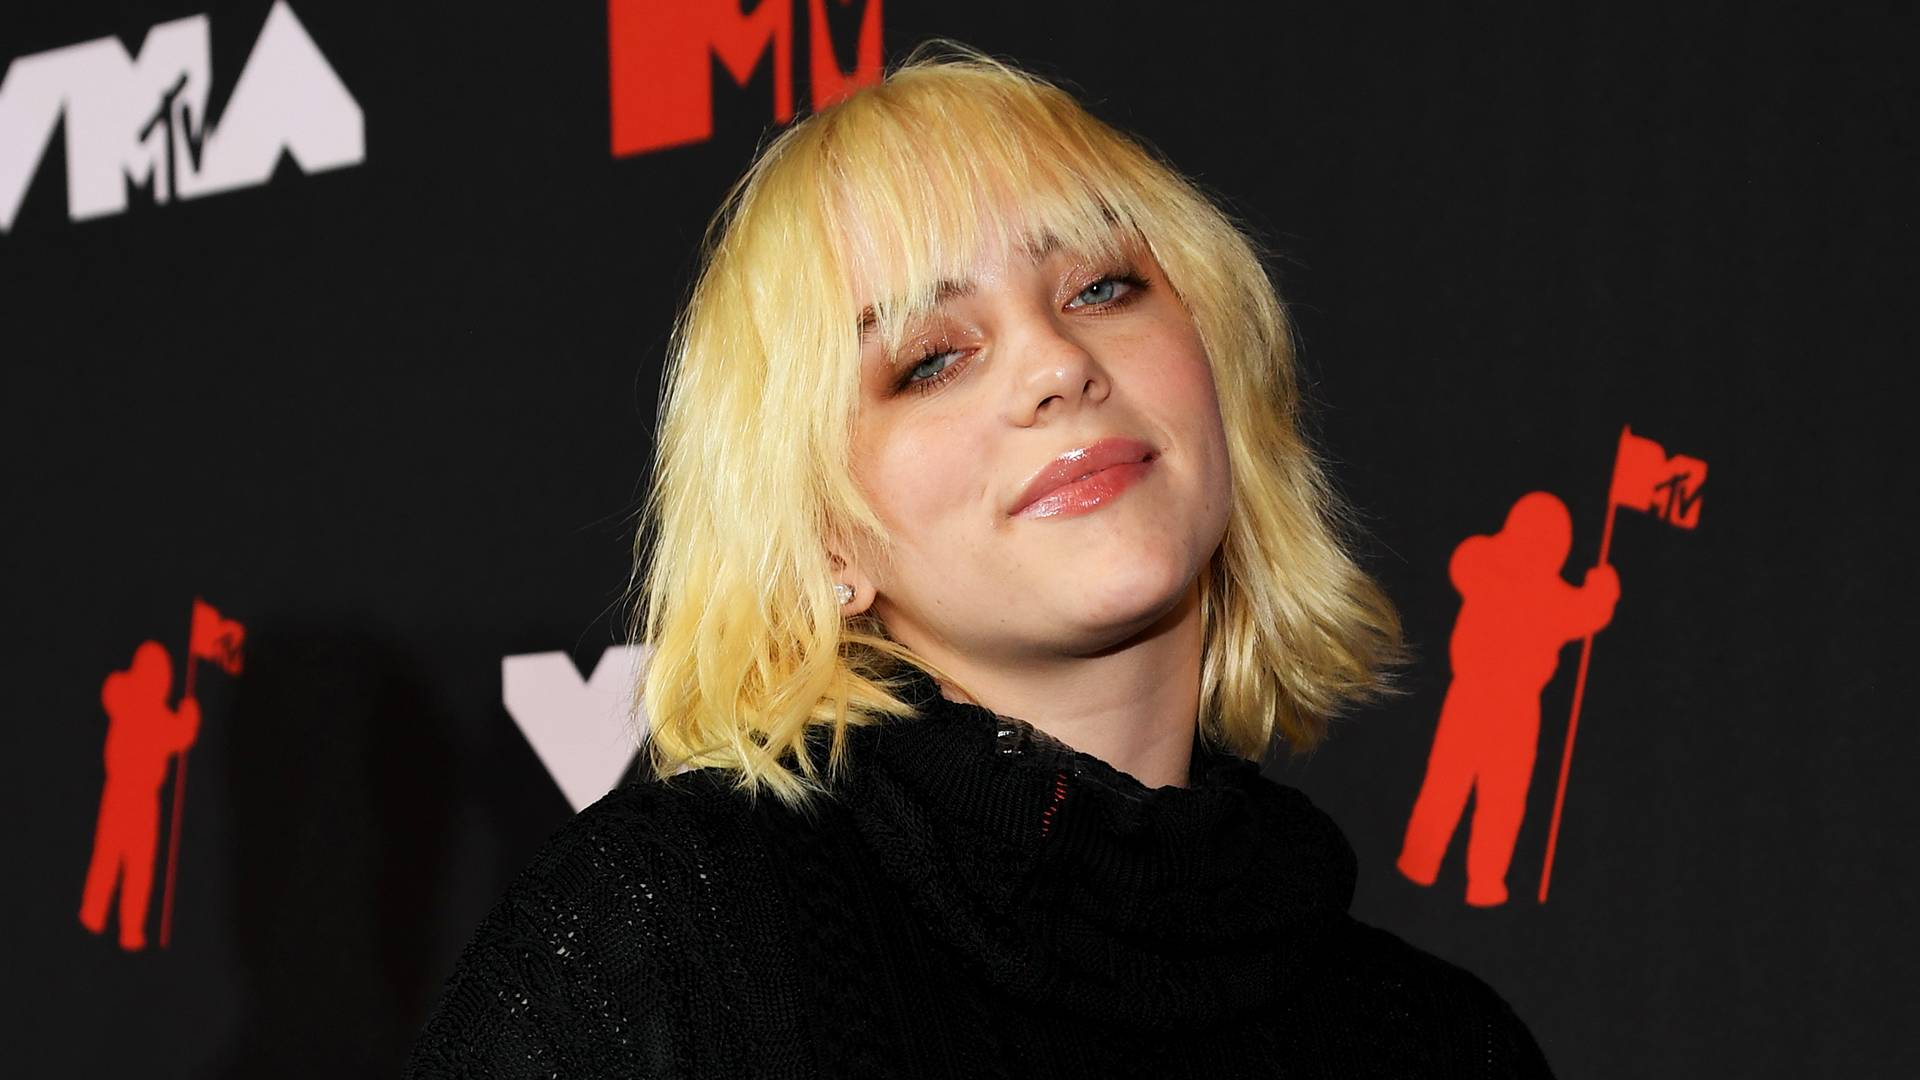 MTV Video Music Awards 2021 | The Best of the VMAs 2021 Red Carpet | Billie Eilish | 1920x1080